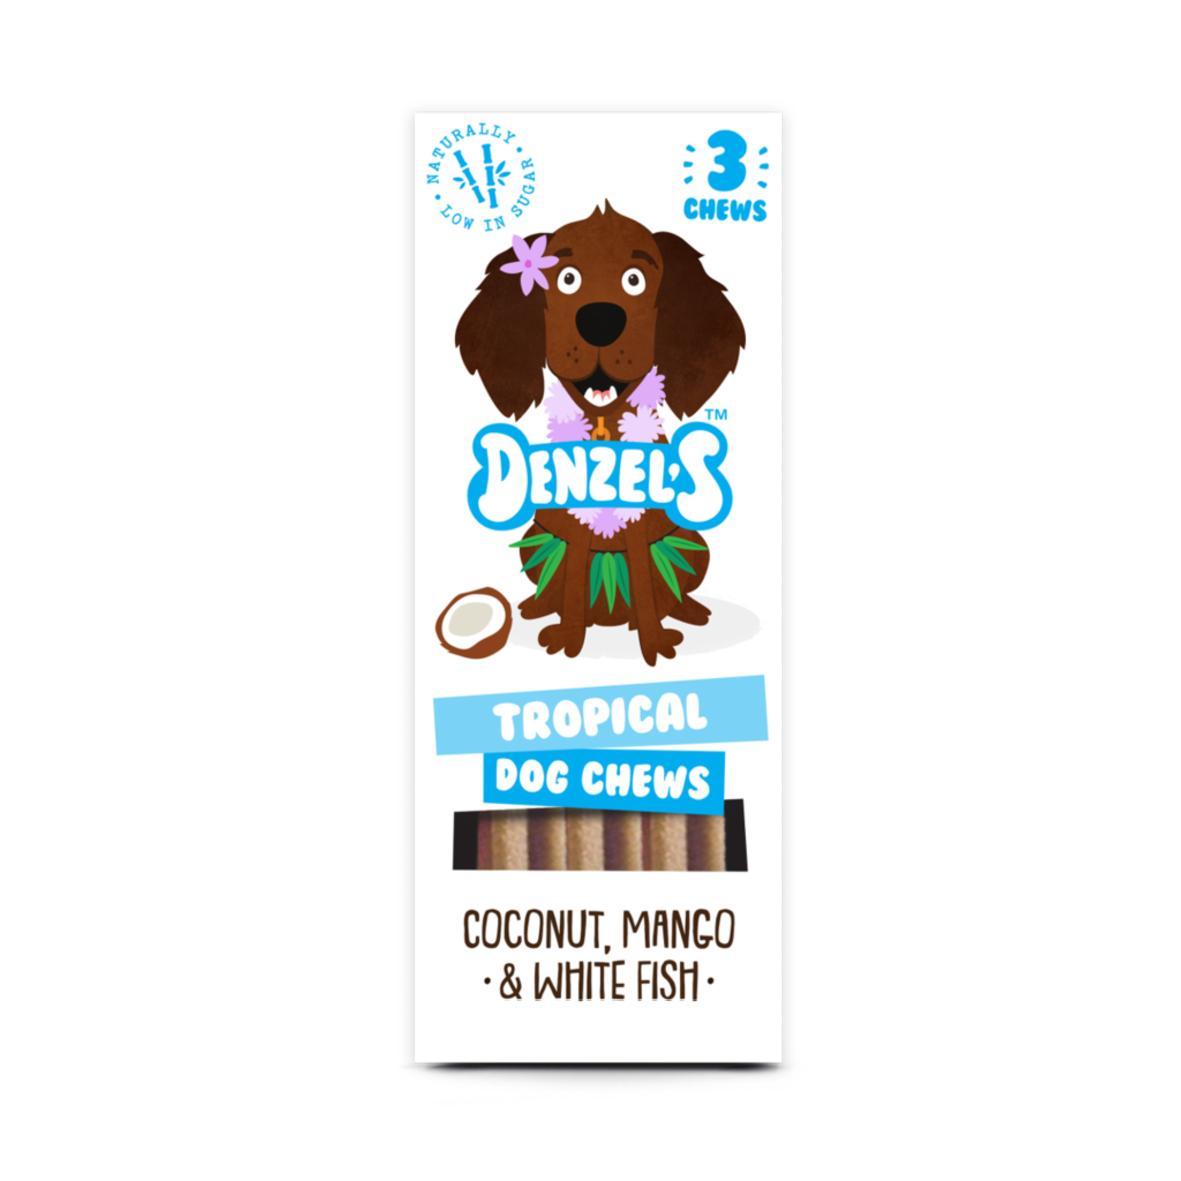 Denzels Tropical Dog Chews Coconut, Mango & White Fish 3pk